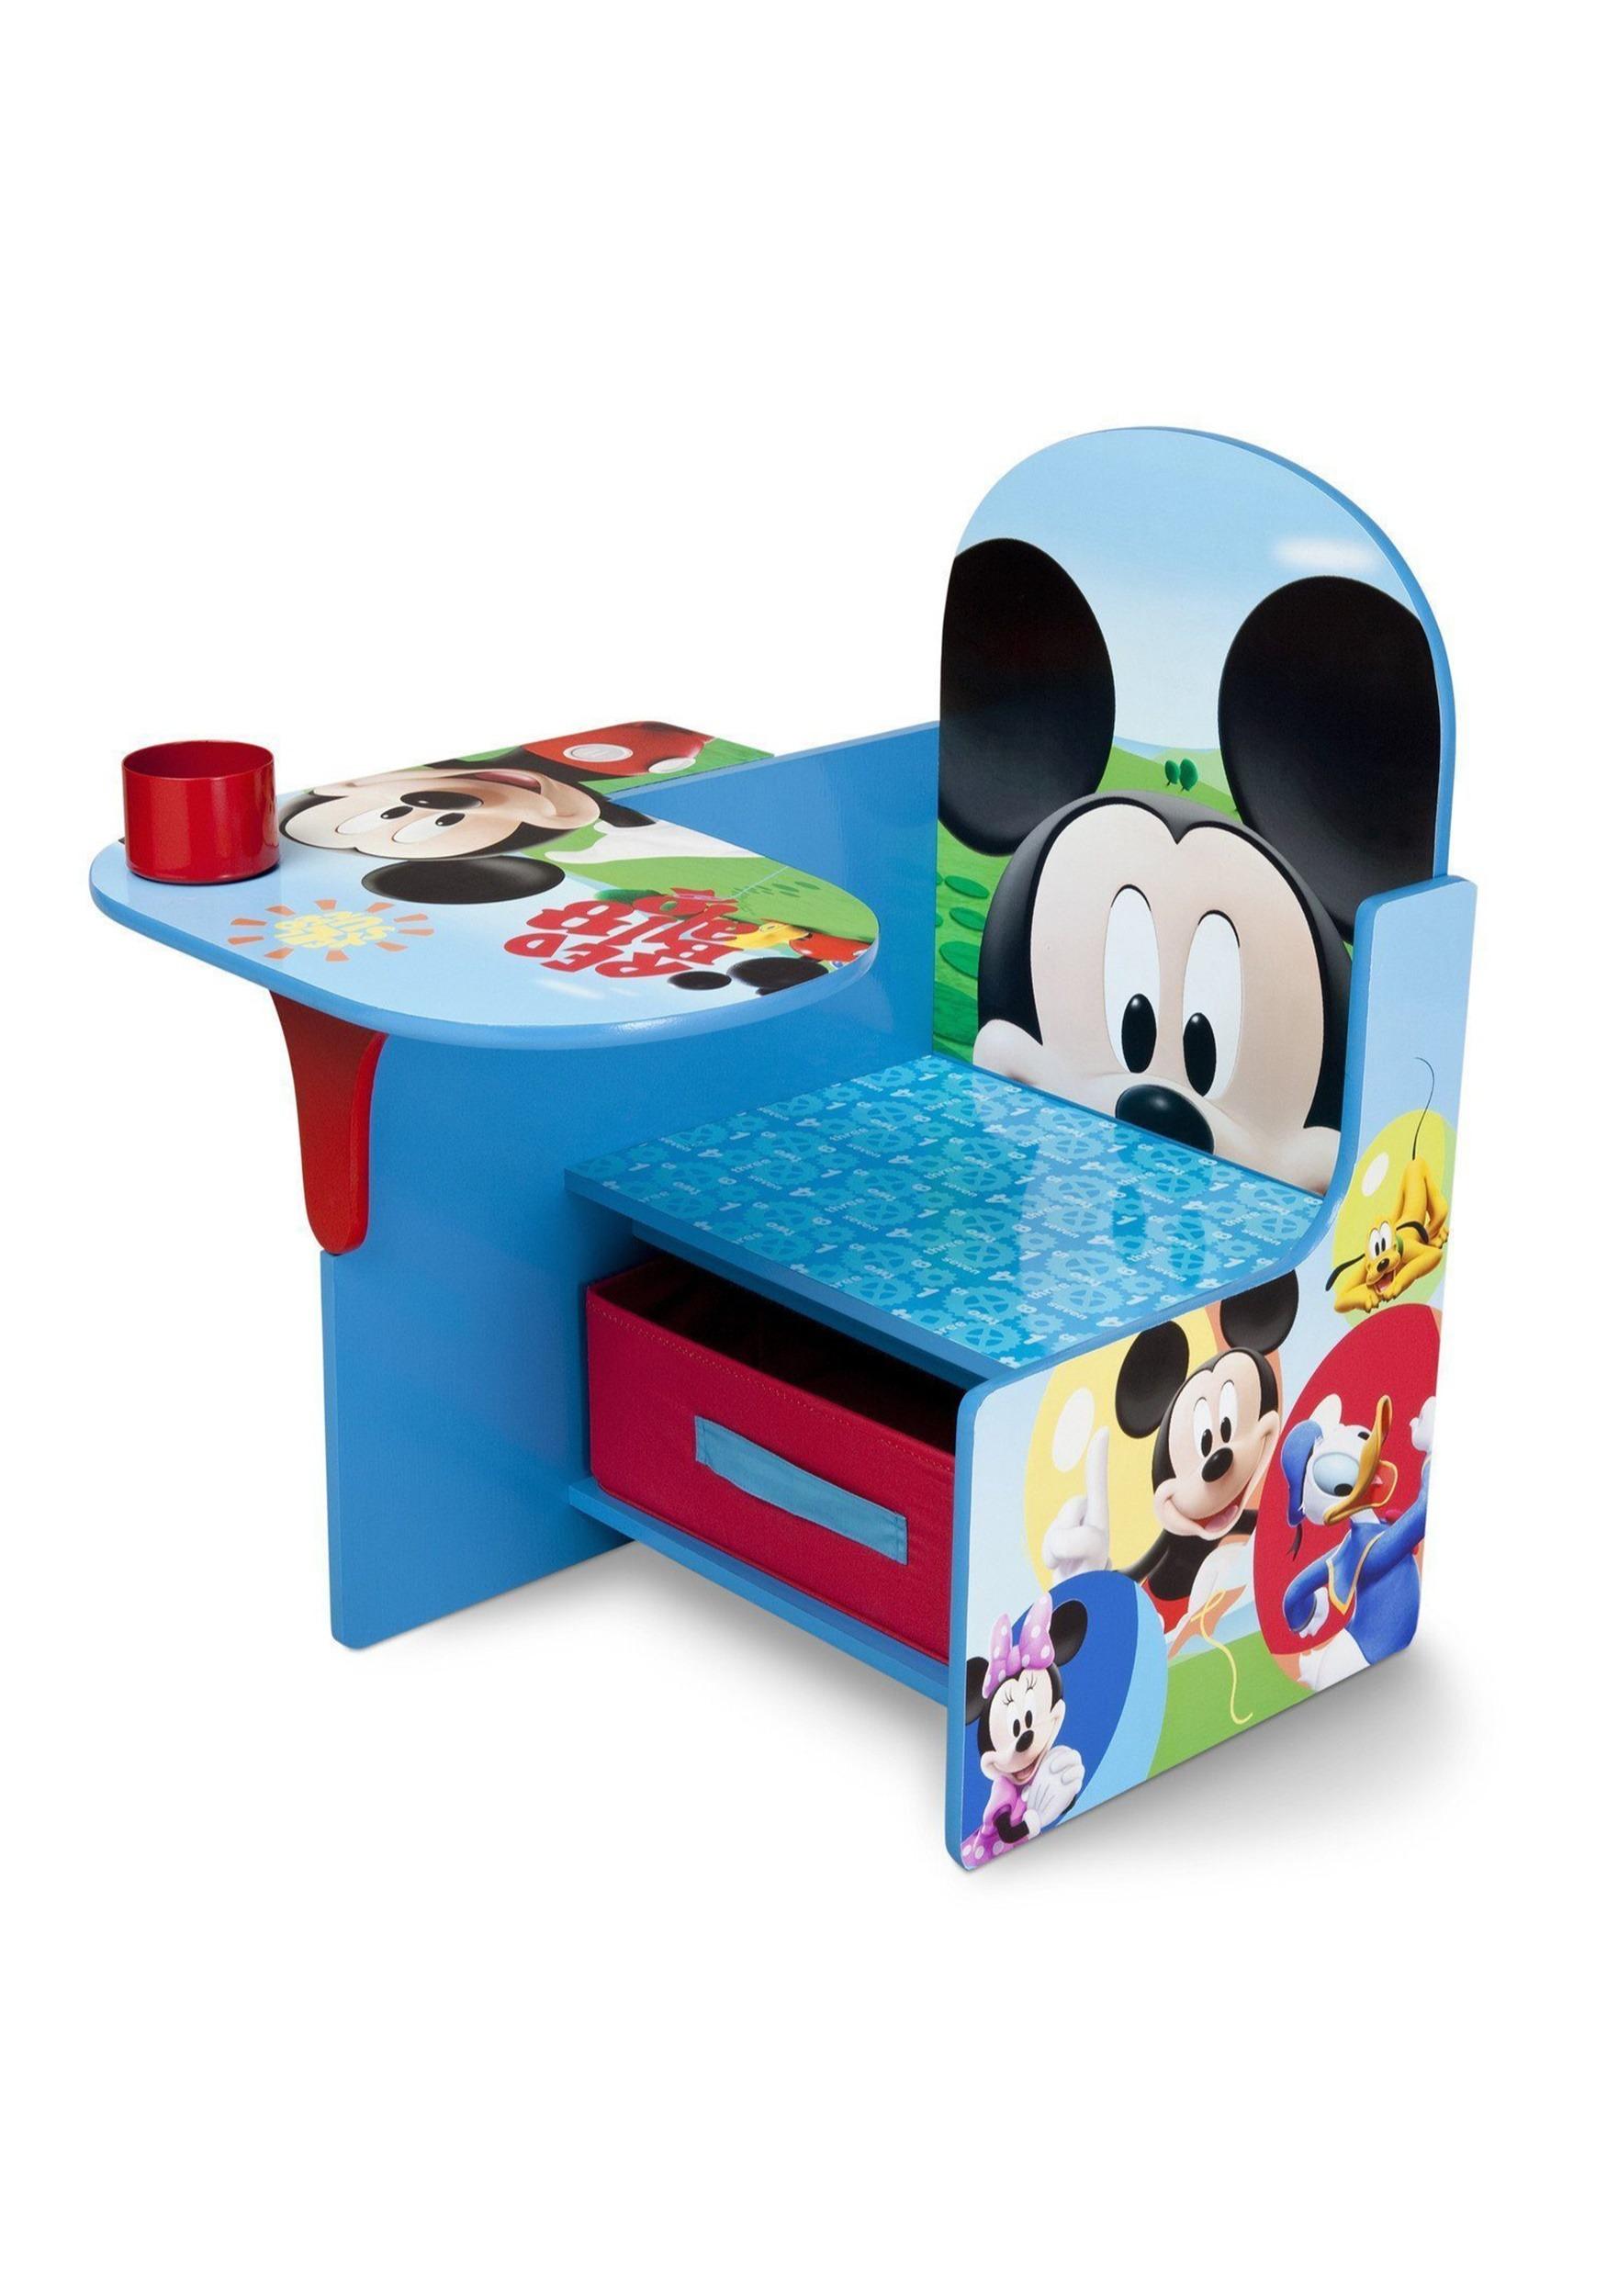 Disney Mickey Mouse Chair Desk W Storage Bin